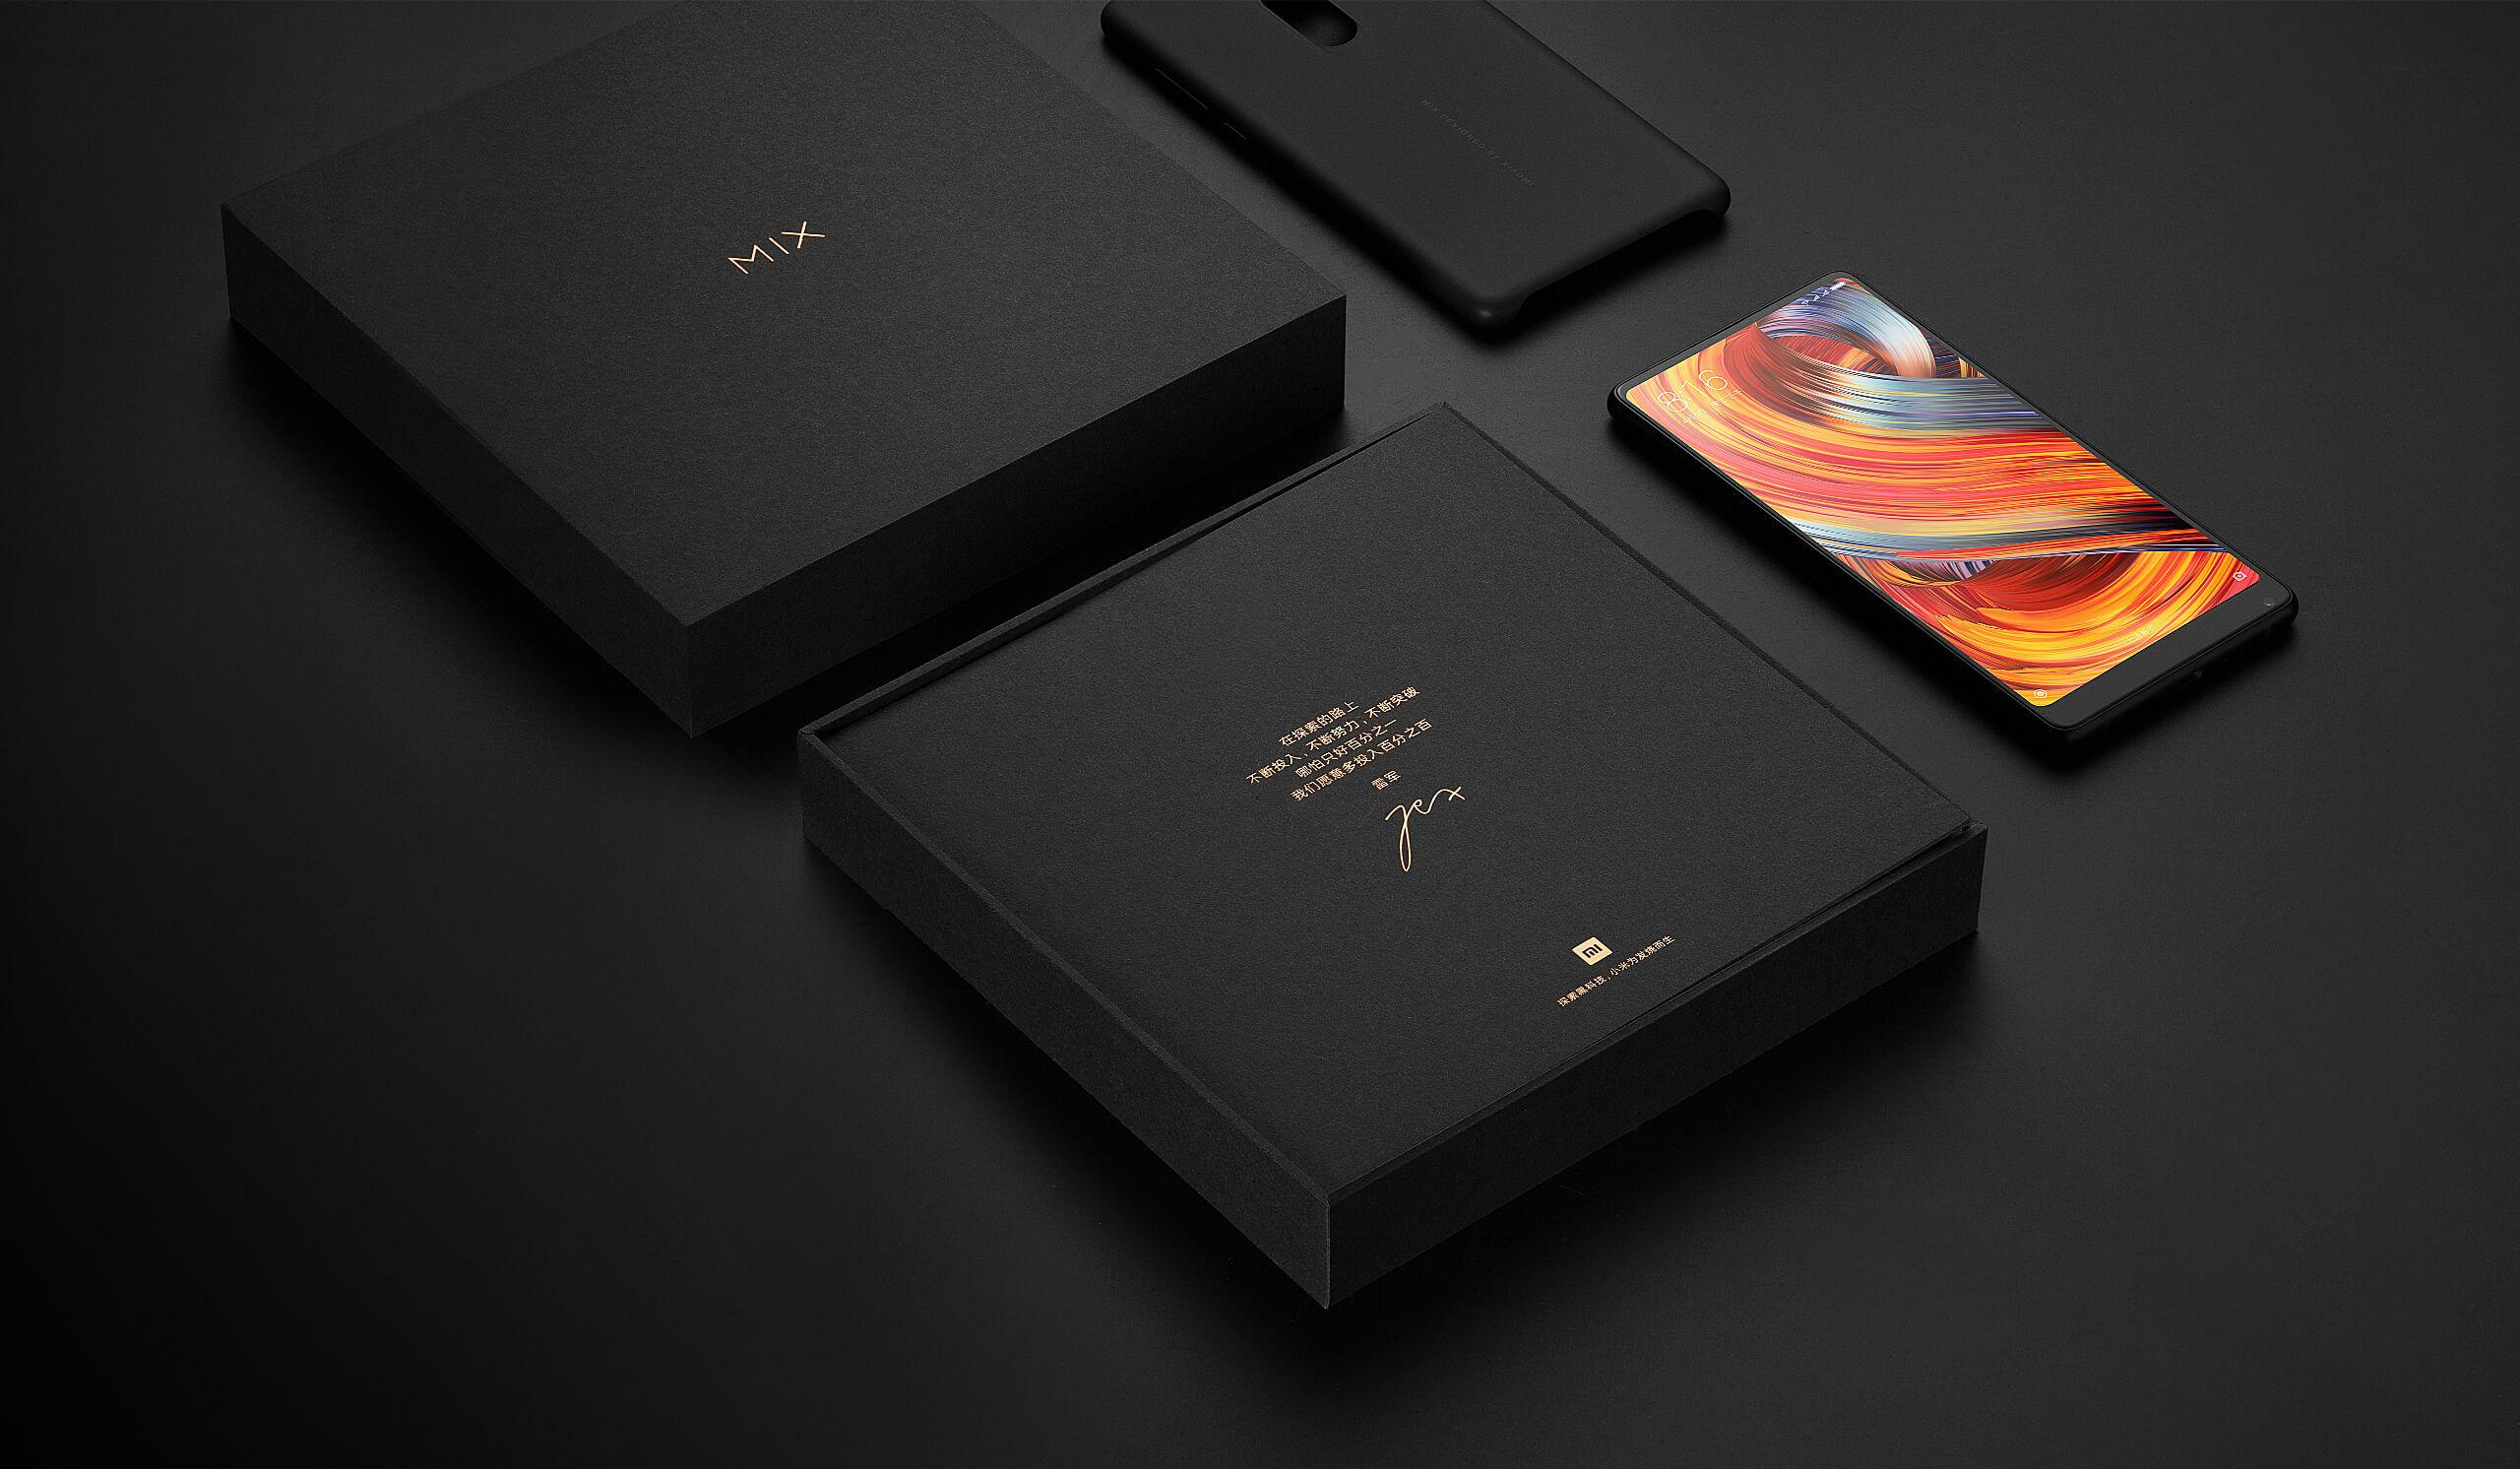 Smartphone Bezel Less 2017 Xiaomi Mi Mix 2